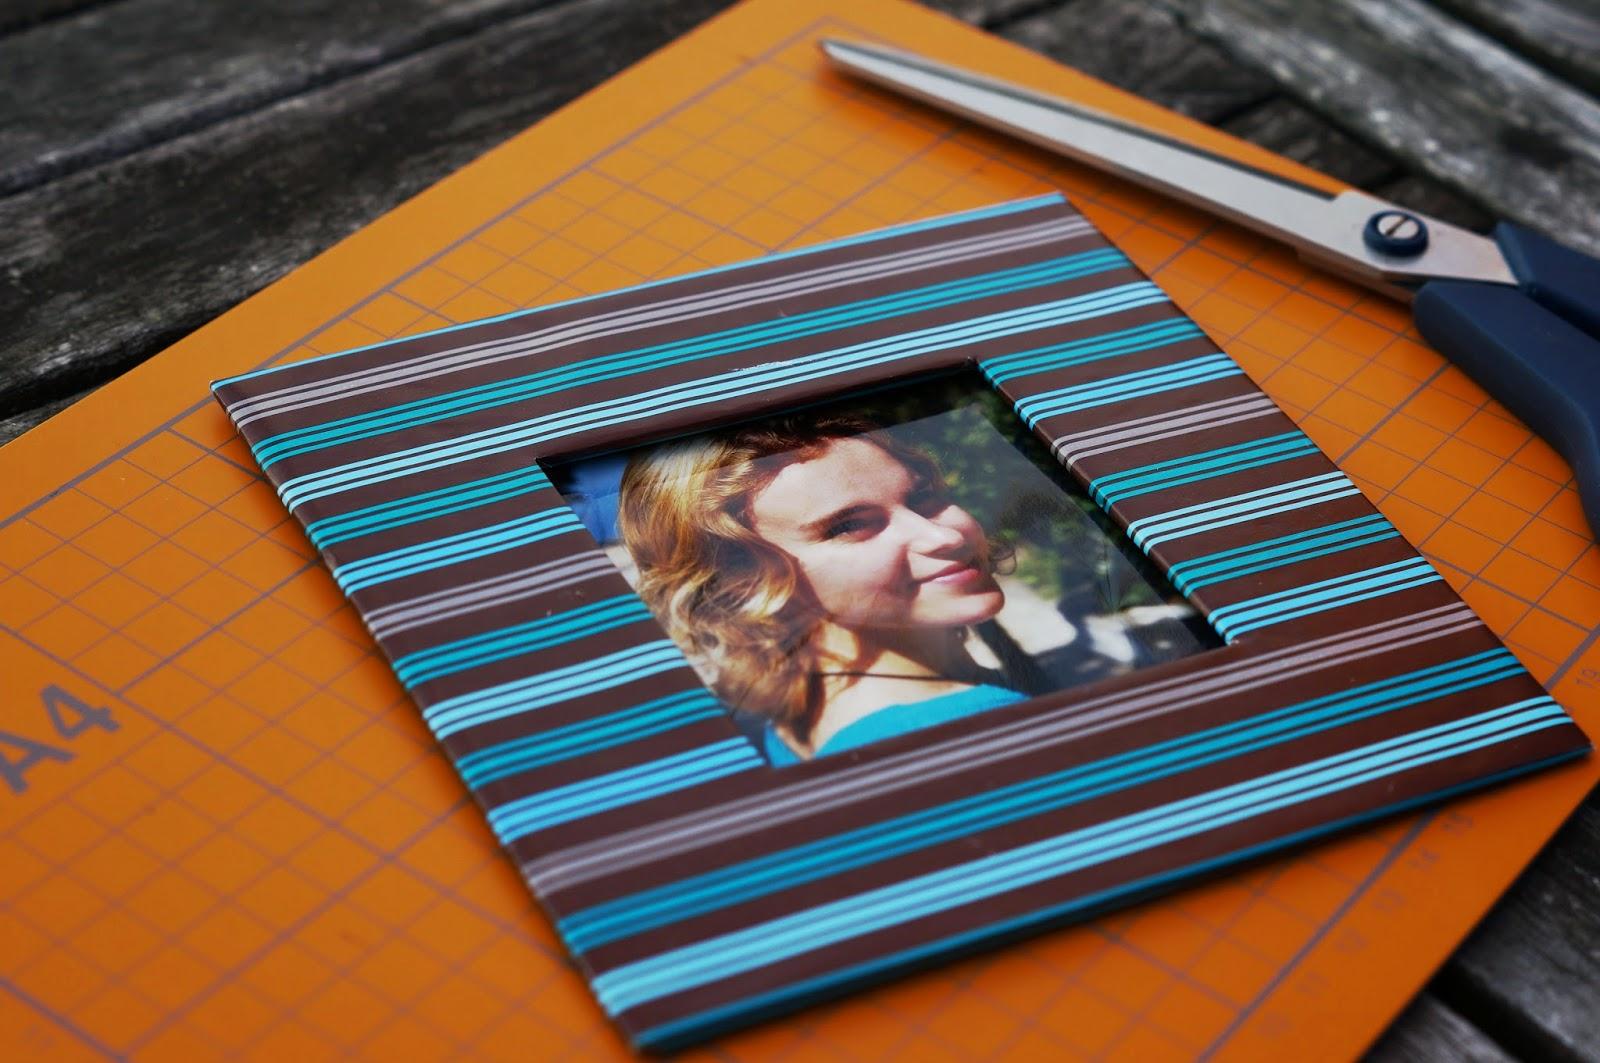 Fotogruesse: DIY: Foto-Magnet - Bild auswechselbar